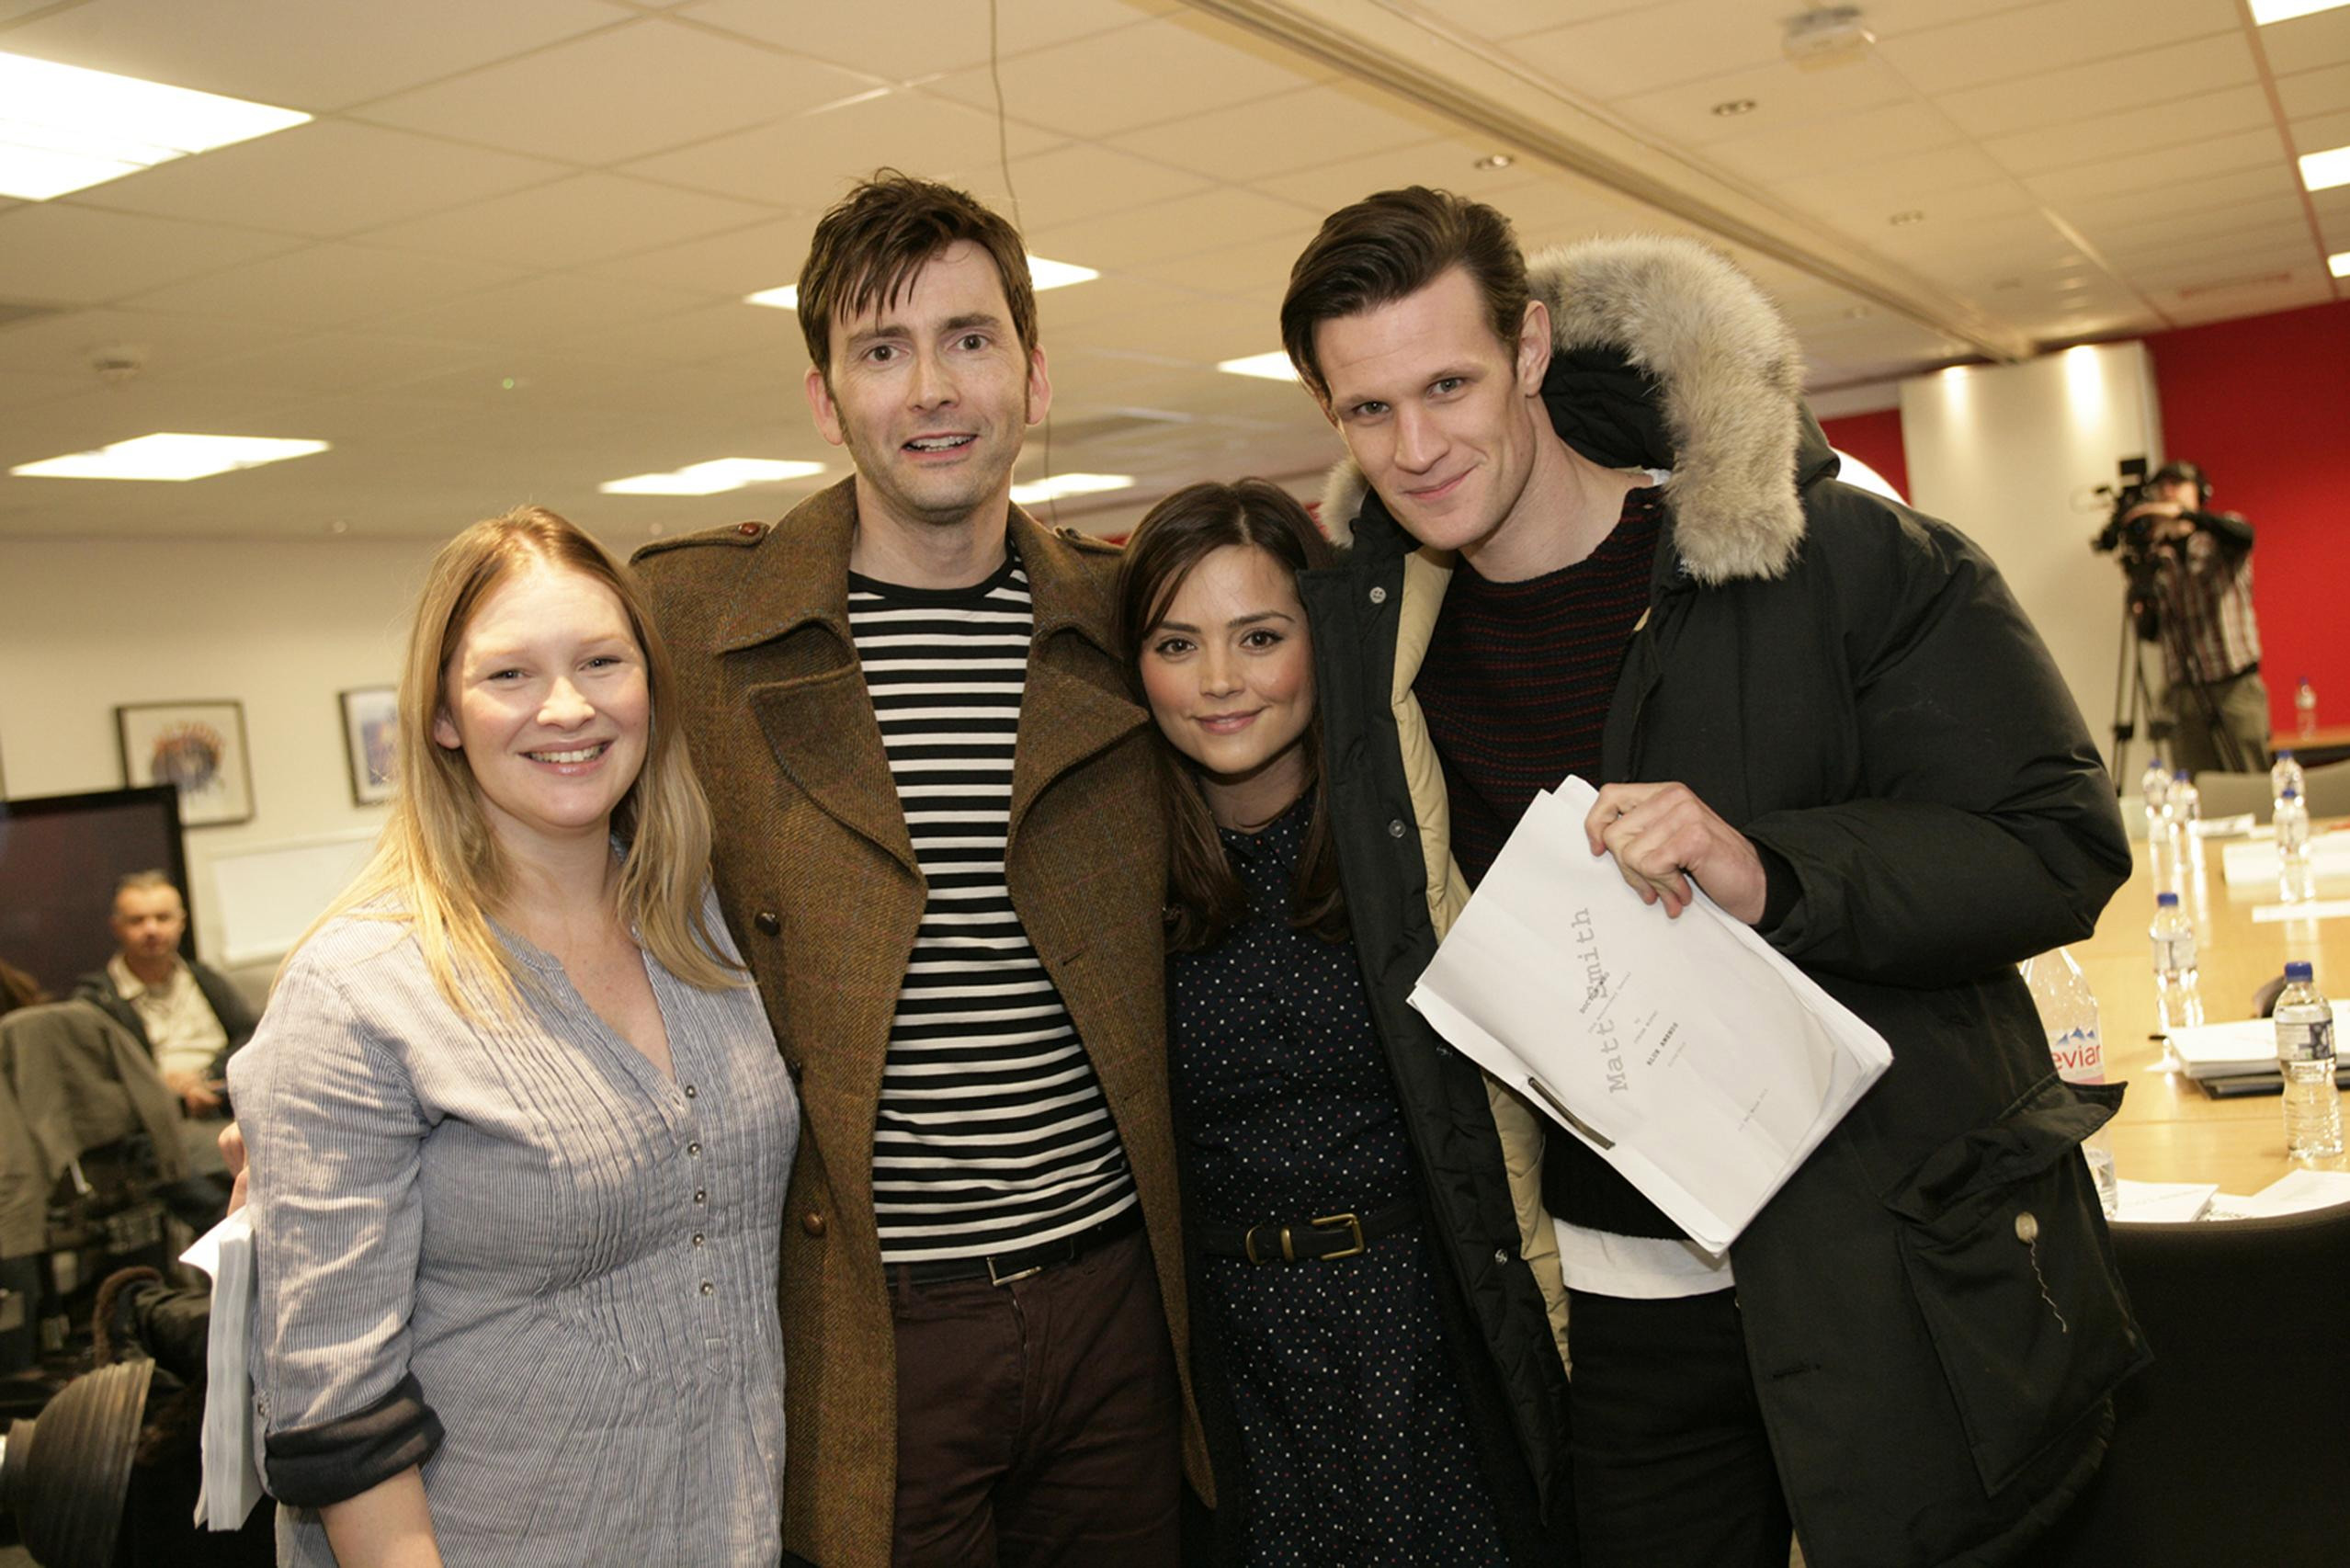 Doctor Who 50th anniversary read through unites Matt Smith and David Tennant